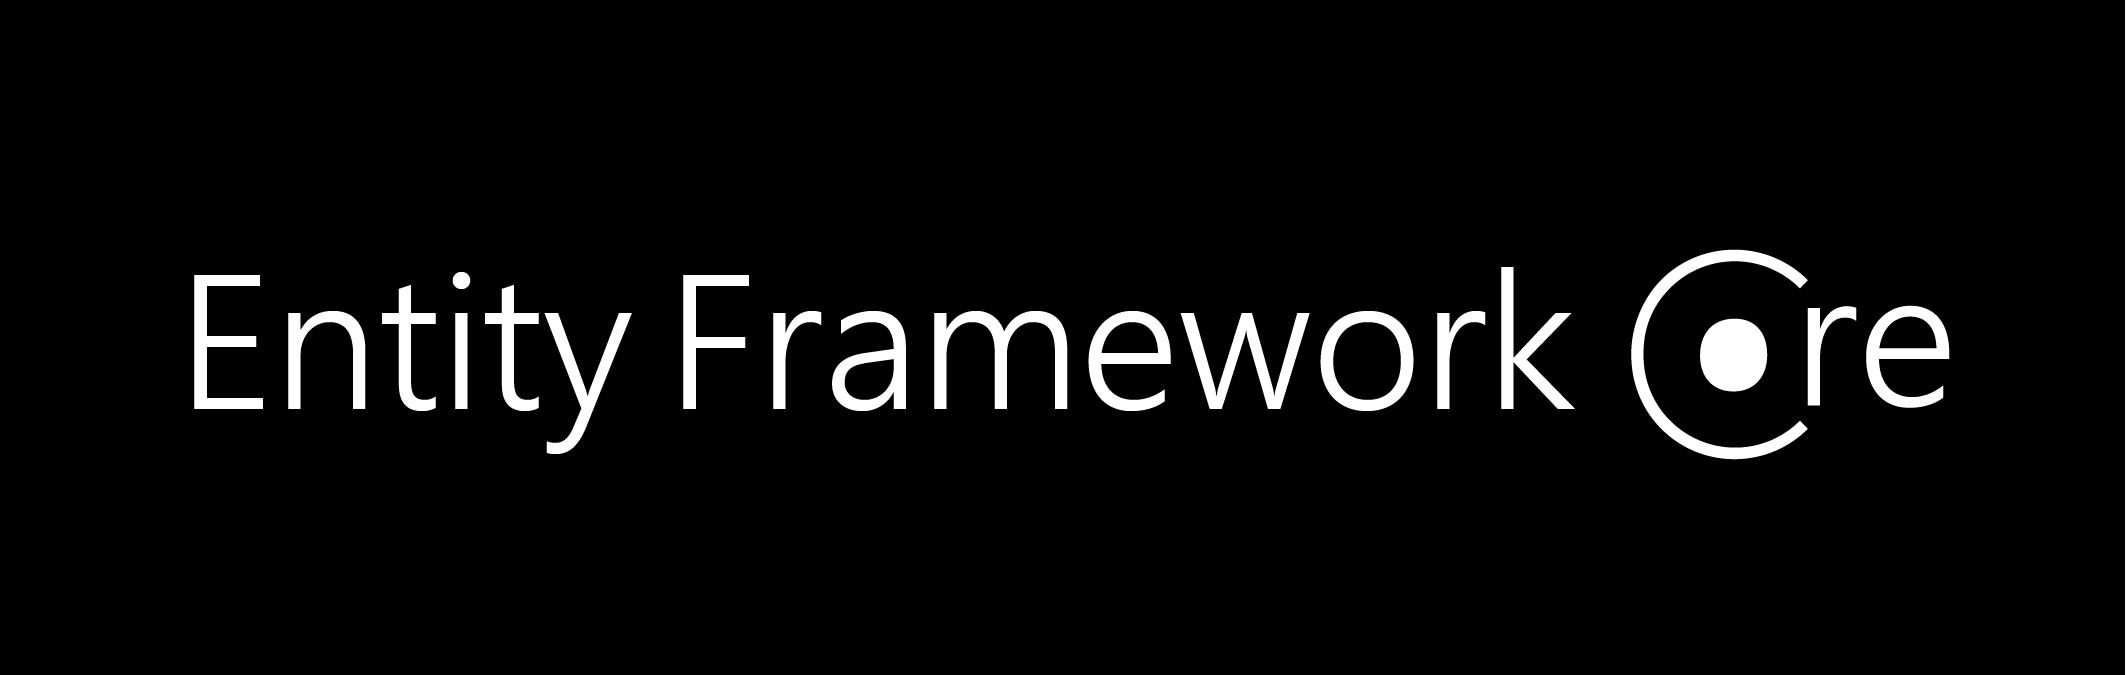 https://raw.githubusercontent.com/campusMVP/dotnetCoreLogoPack/master/Entity%20Framework%20Core/Bitmap%20RGB/Bitmap-BIG_Entity-Framework-Core-Logo_Black_Boxed.png